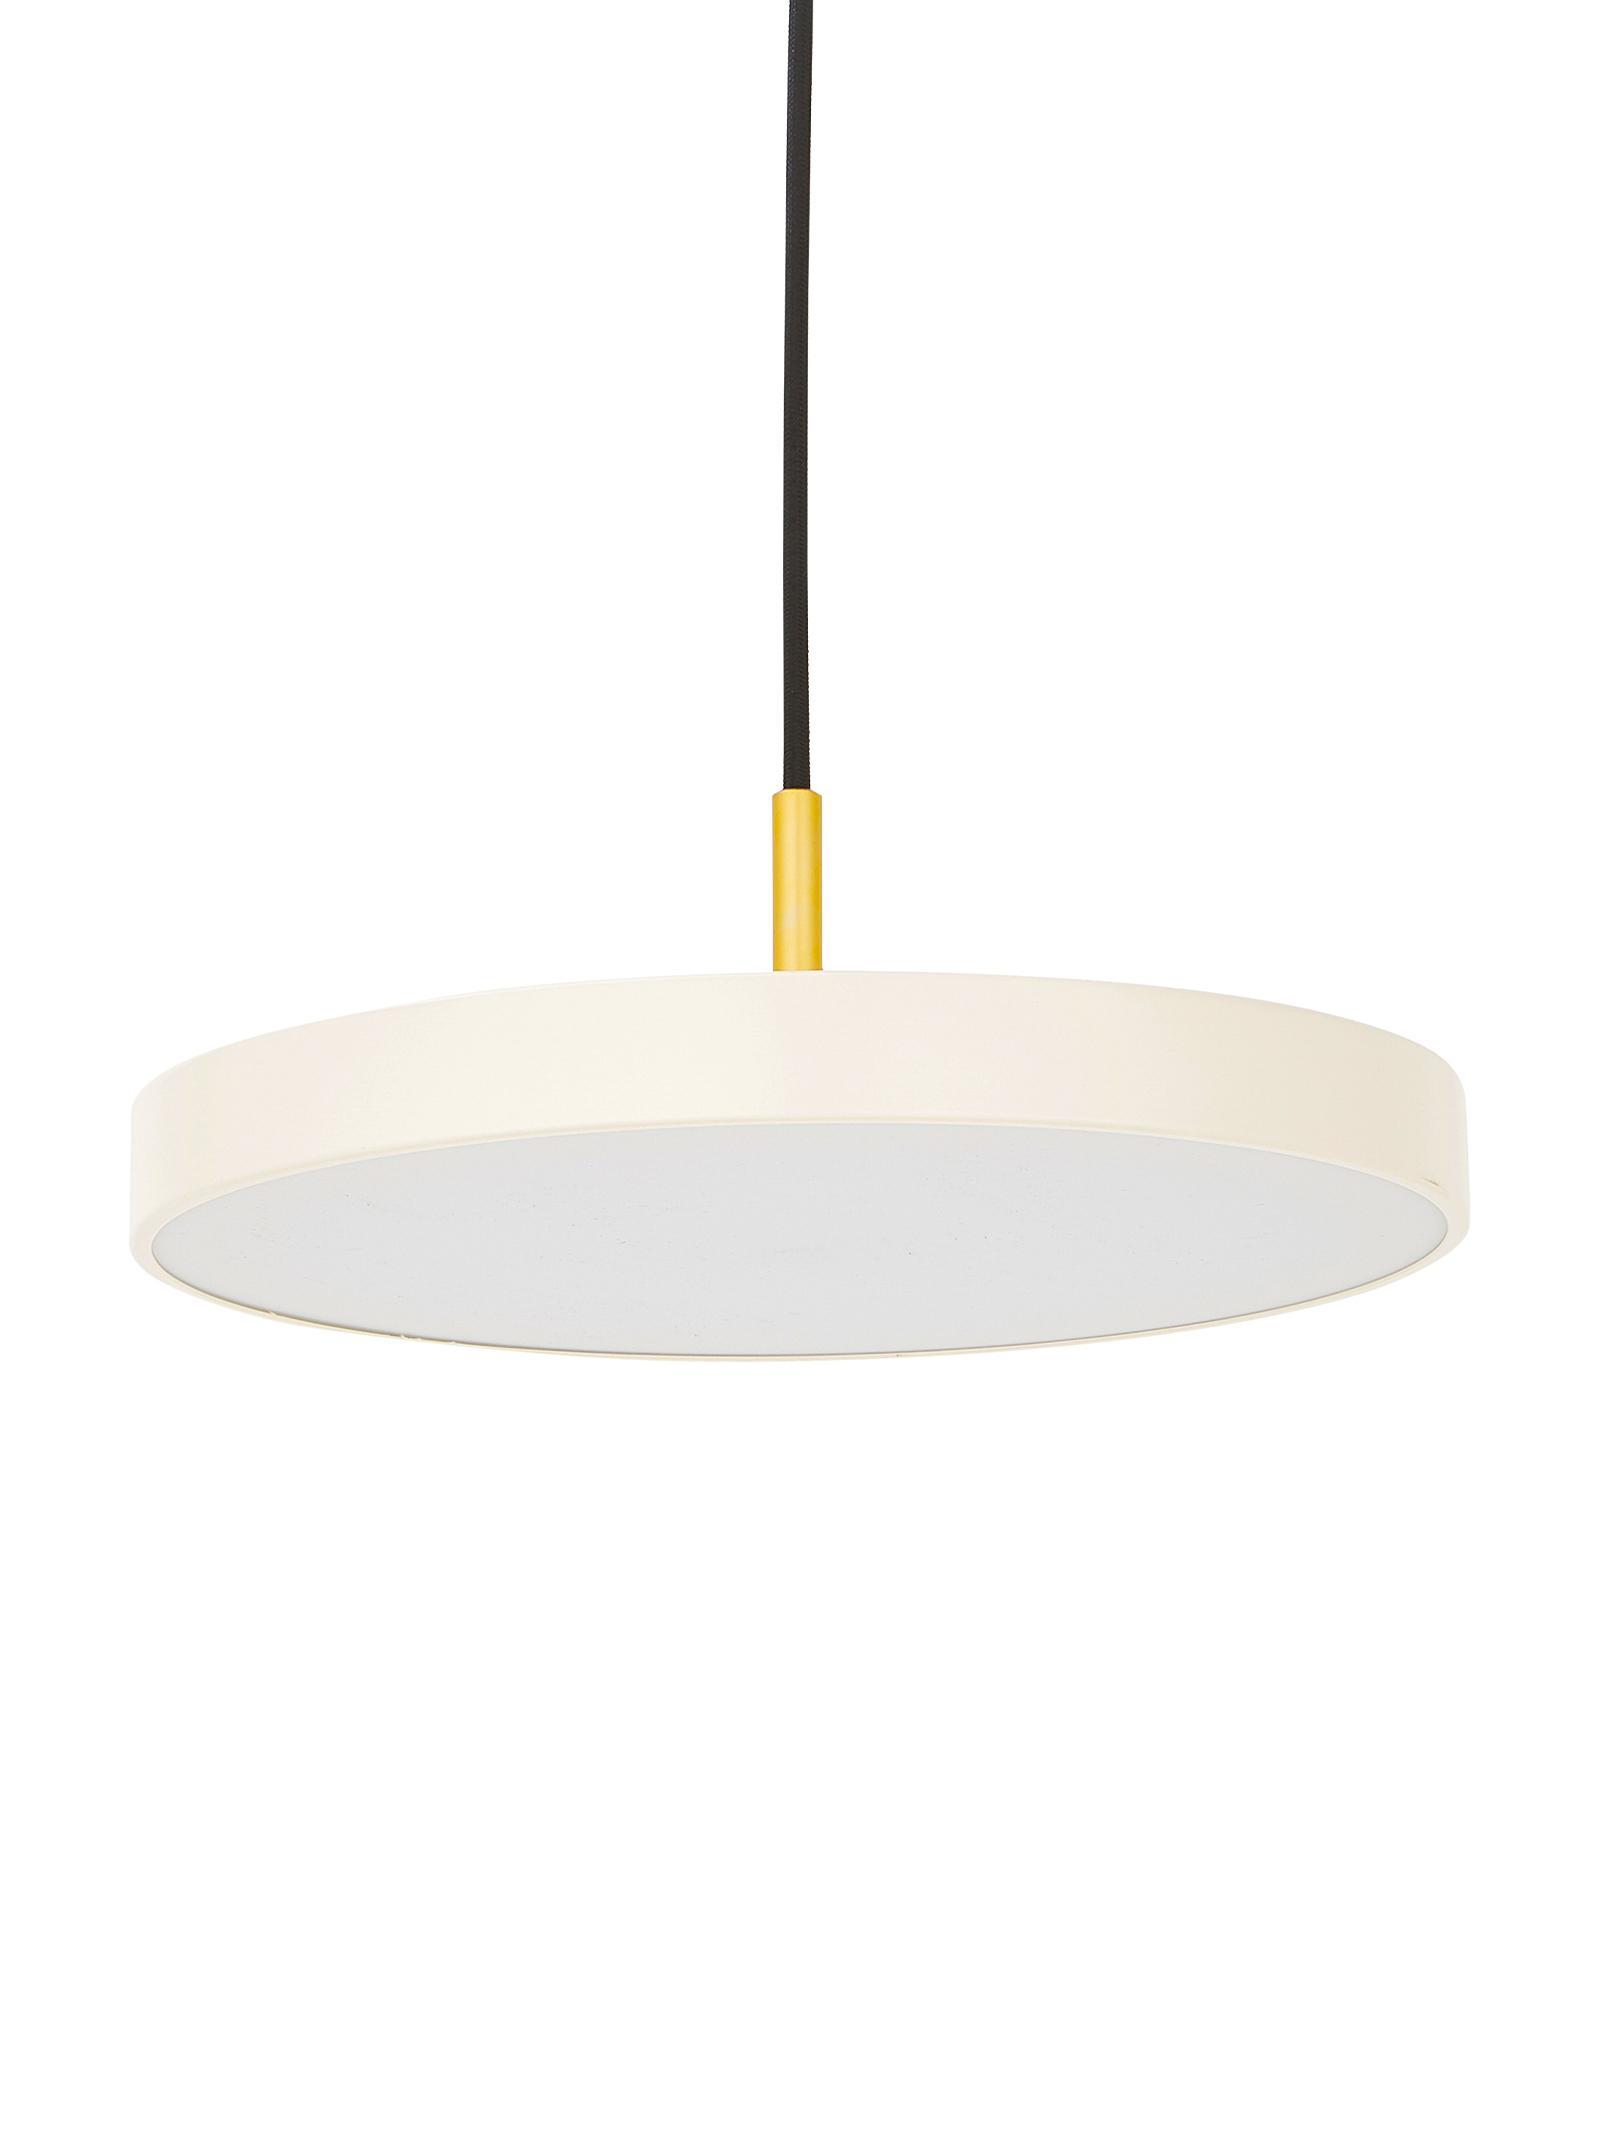 Design LED Pendelleuchte Asteria, Lampenschirm: Aluminium, lackiert, Perlweiß, Goldfarben, Ø 31 x H 14 cm